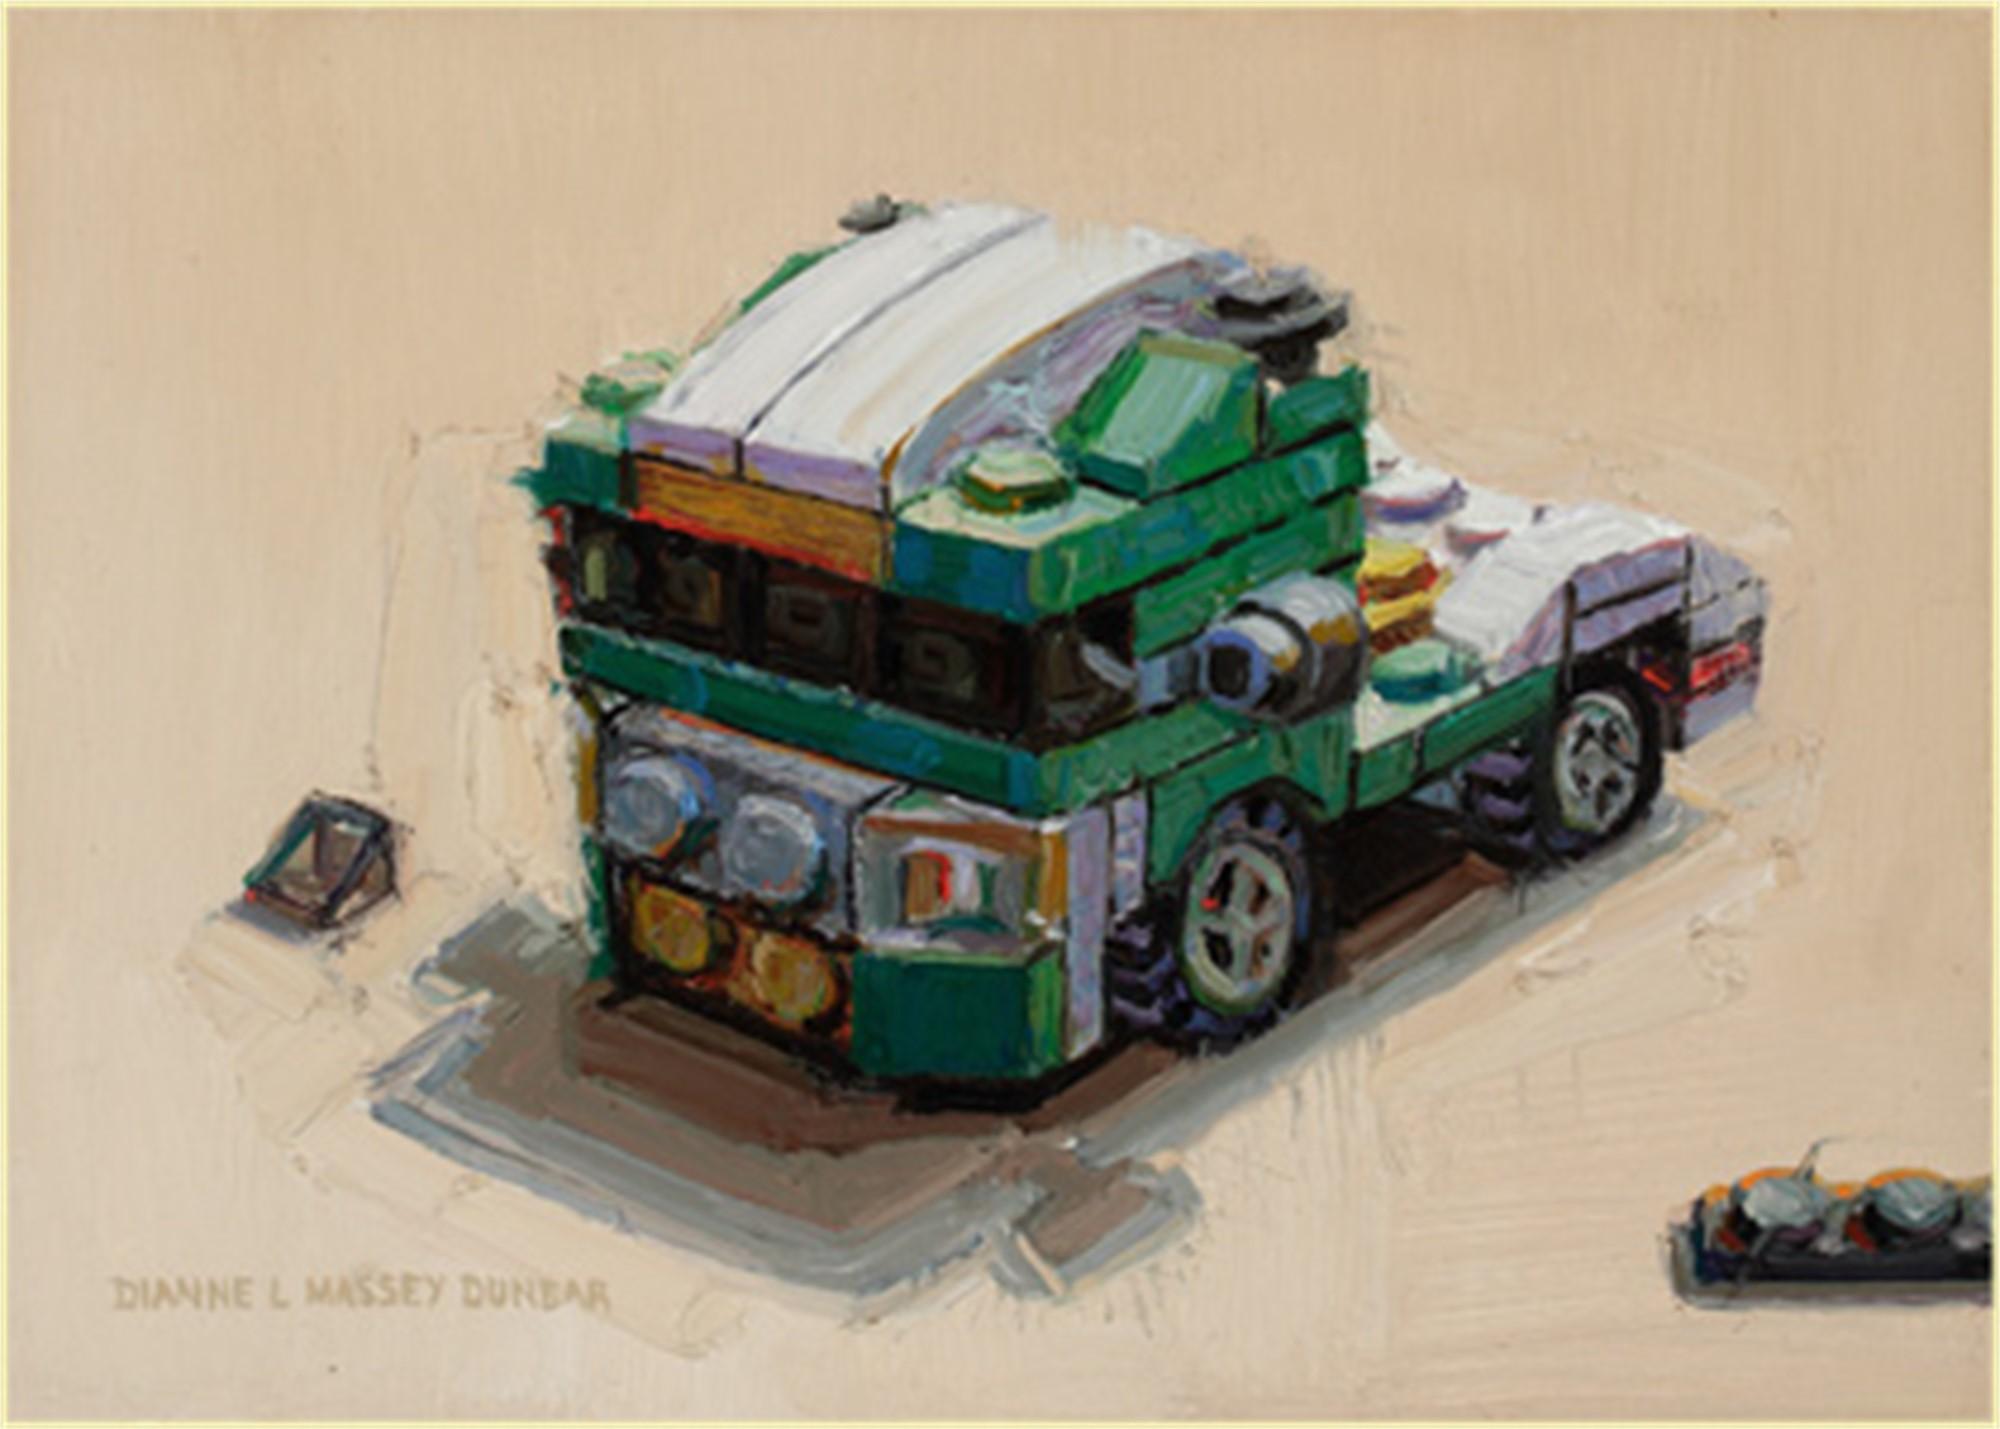 Semi Tractor by Dianne L Massey Dunbar